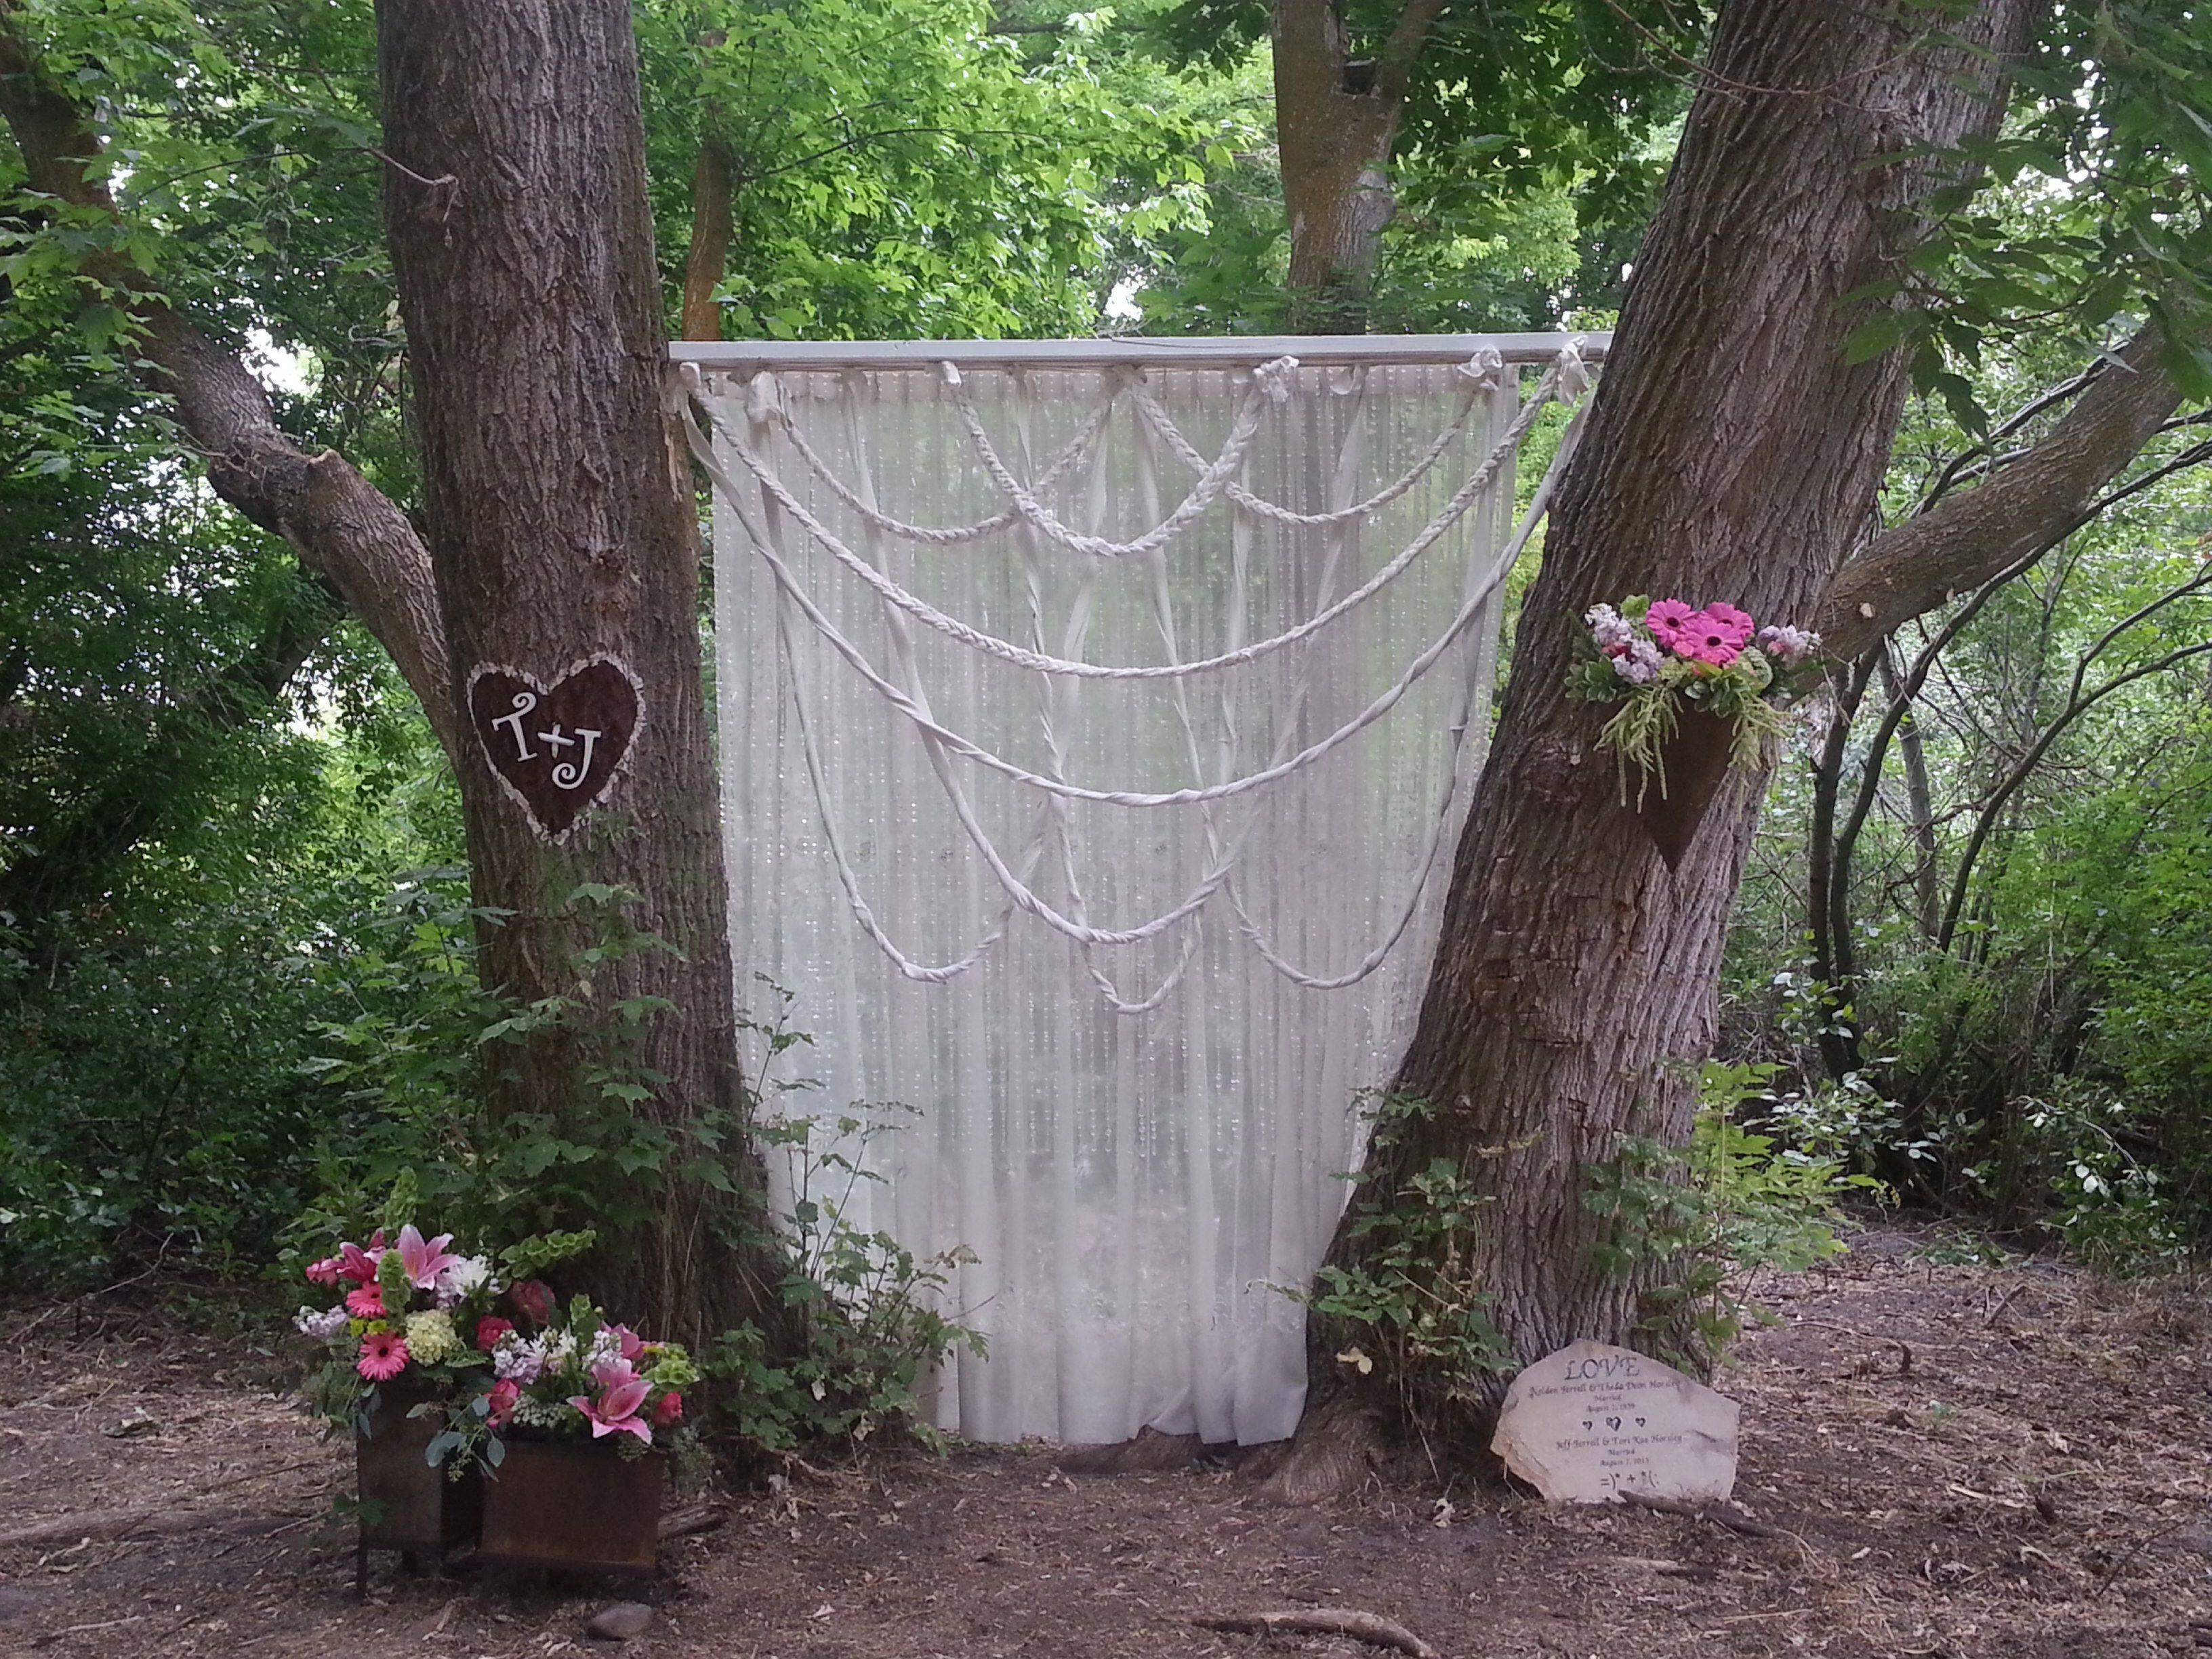 Outdoor wedding backdrop | My Crafty Creations | Pinterest